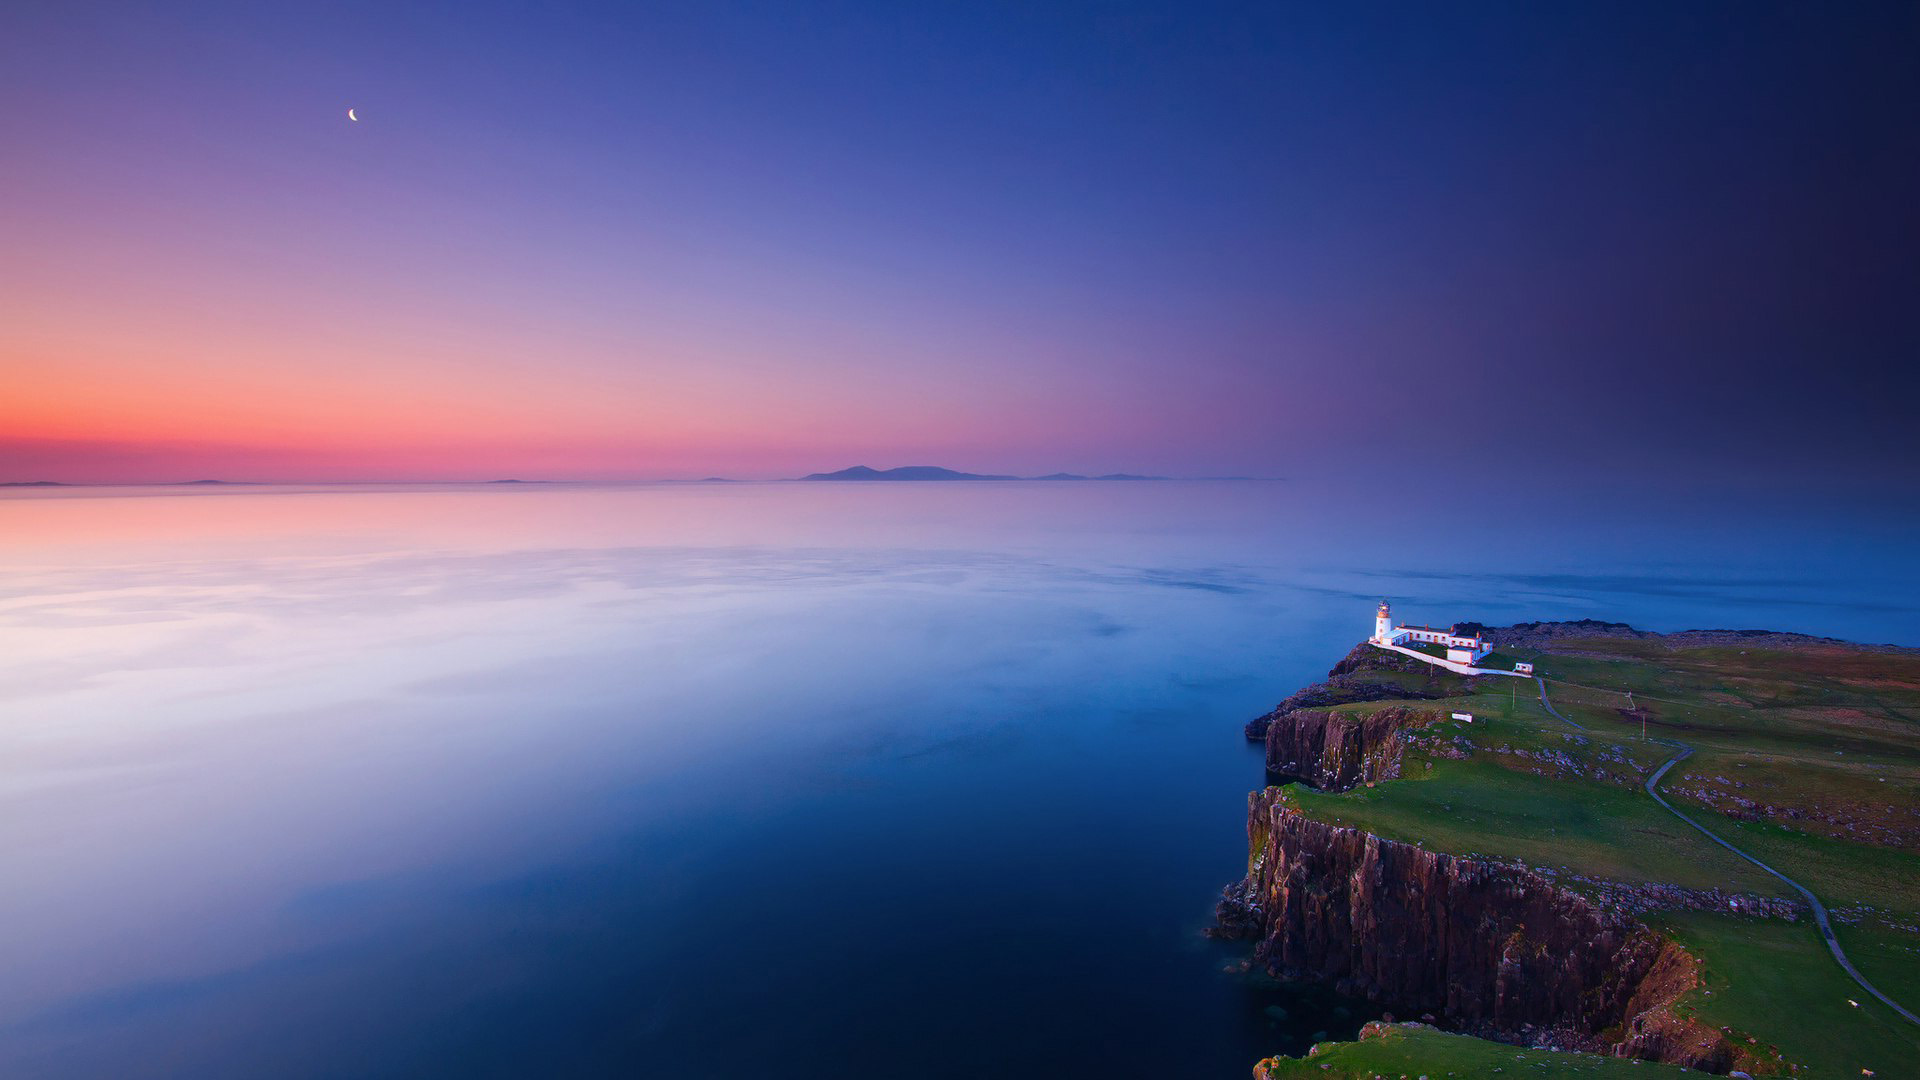 Природа обои, Литл-Минч в Шотландии, hd